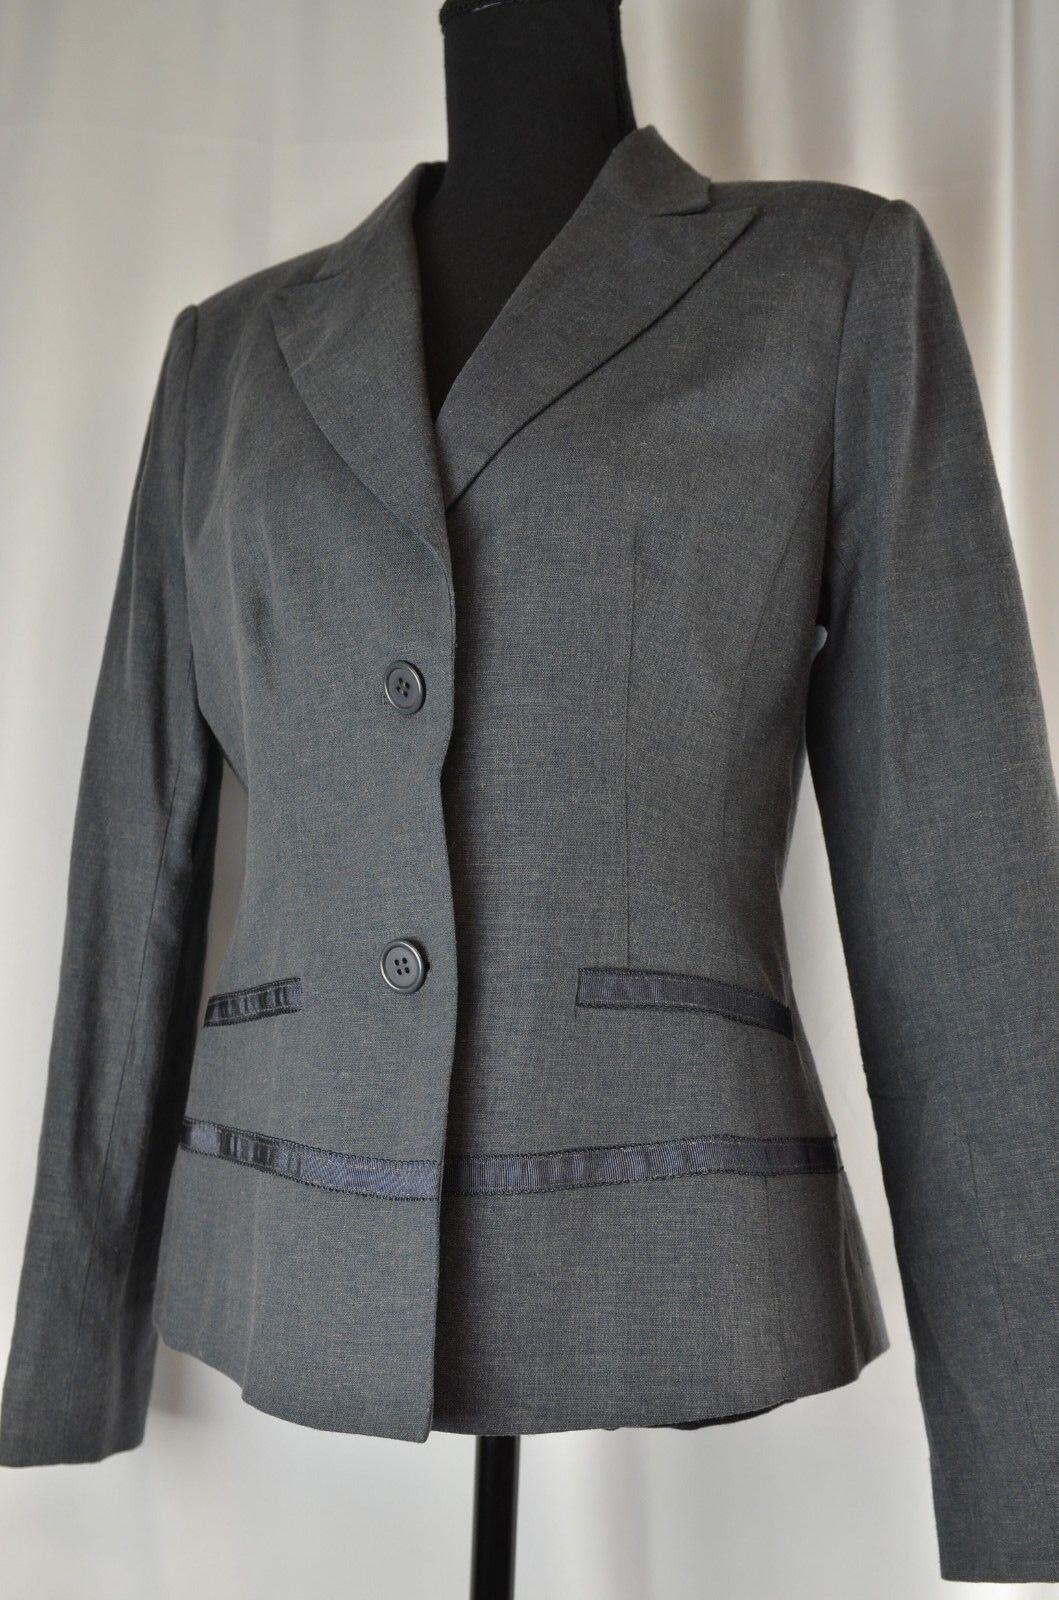 New Carriere Studio Women's Blazer Size 38 Linen Blend Charcoal Career 8 US  260